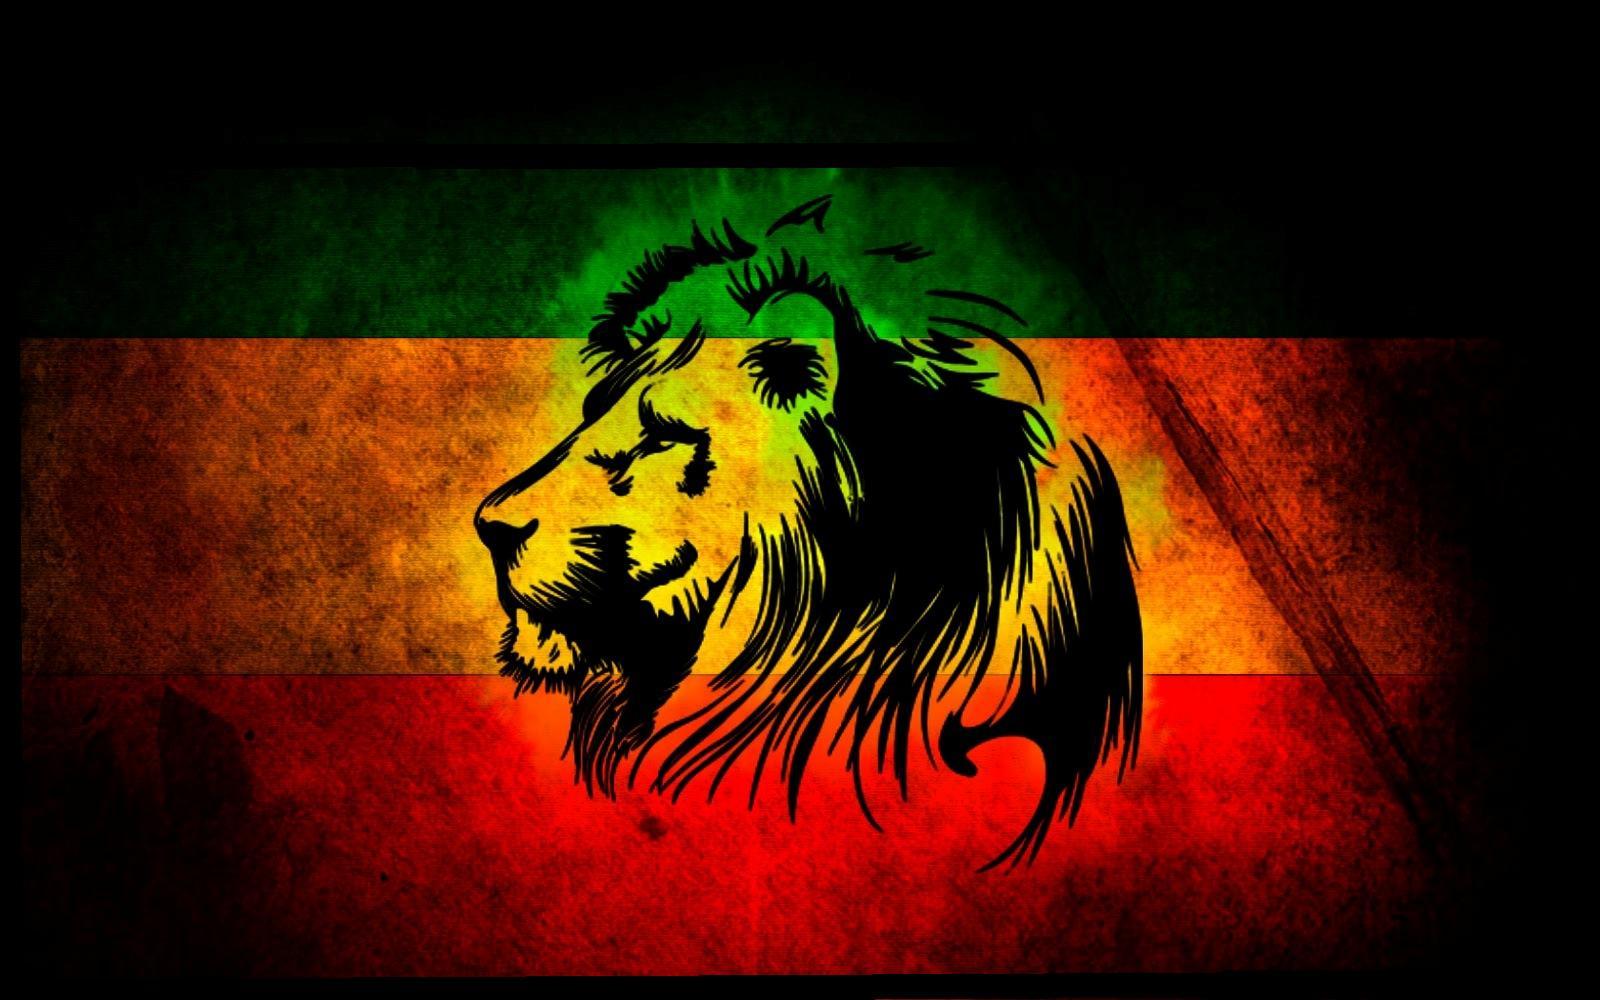 Rastafarian symbols wallpaper best rasta wallpaper for free rastafarian symbols wallpaper best rasta wallpaper for free download on mobomarket 1600x1000 biocorpaavc Image collections